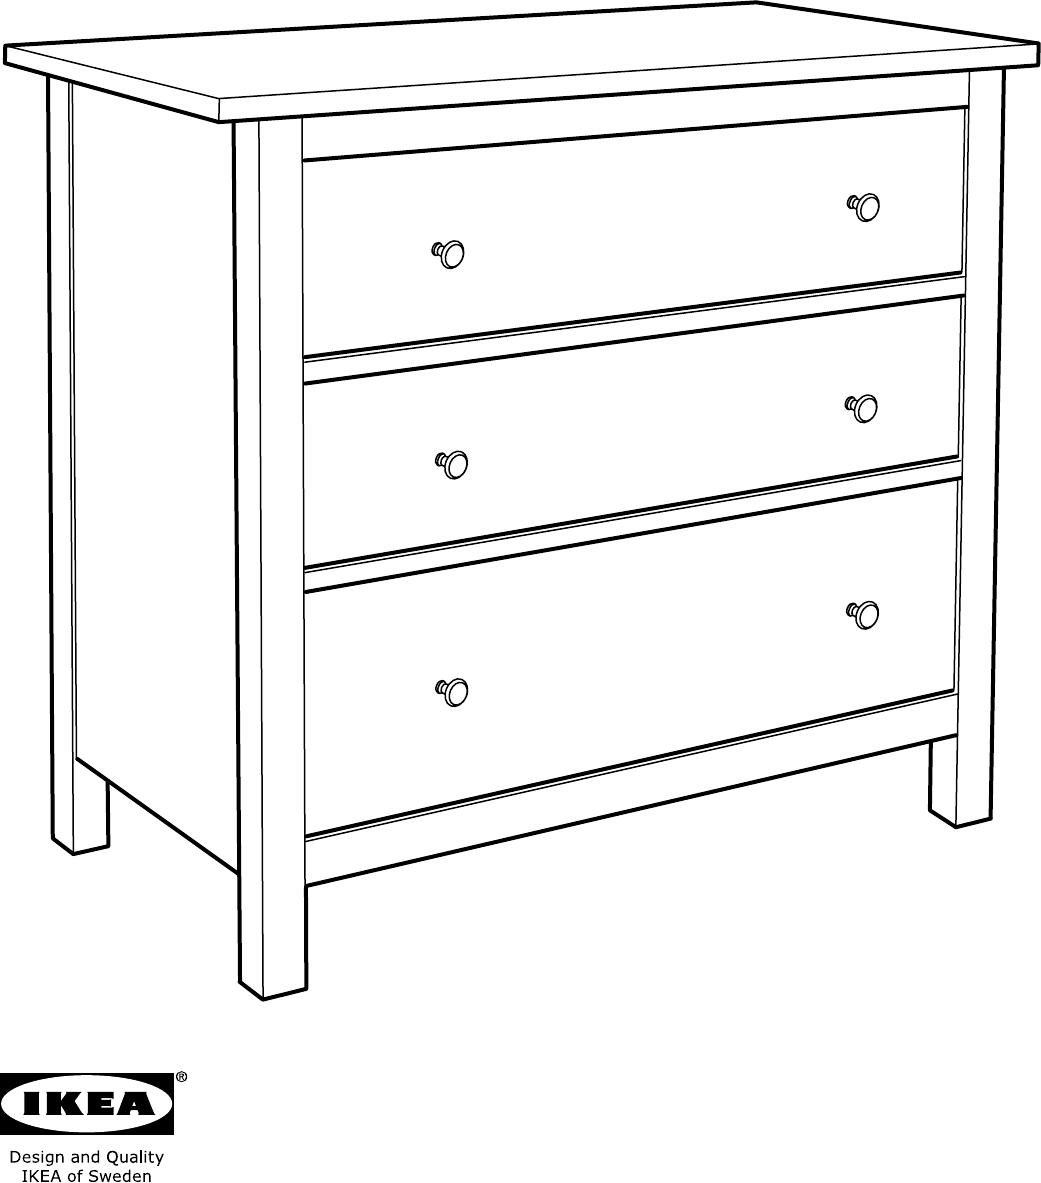 Handleiding Ikea Hemnes Ladekast 3 Lades Pagina 2 Van 20